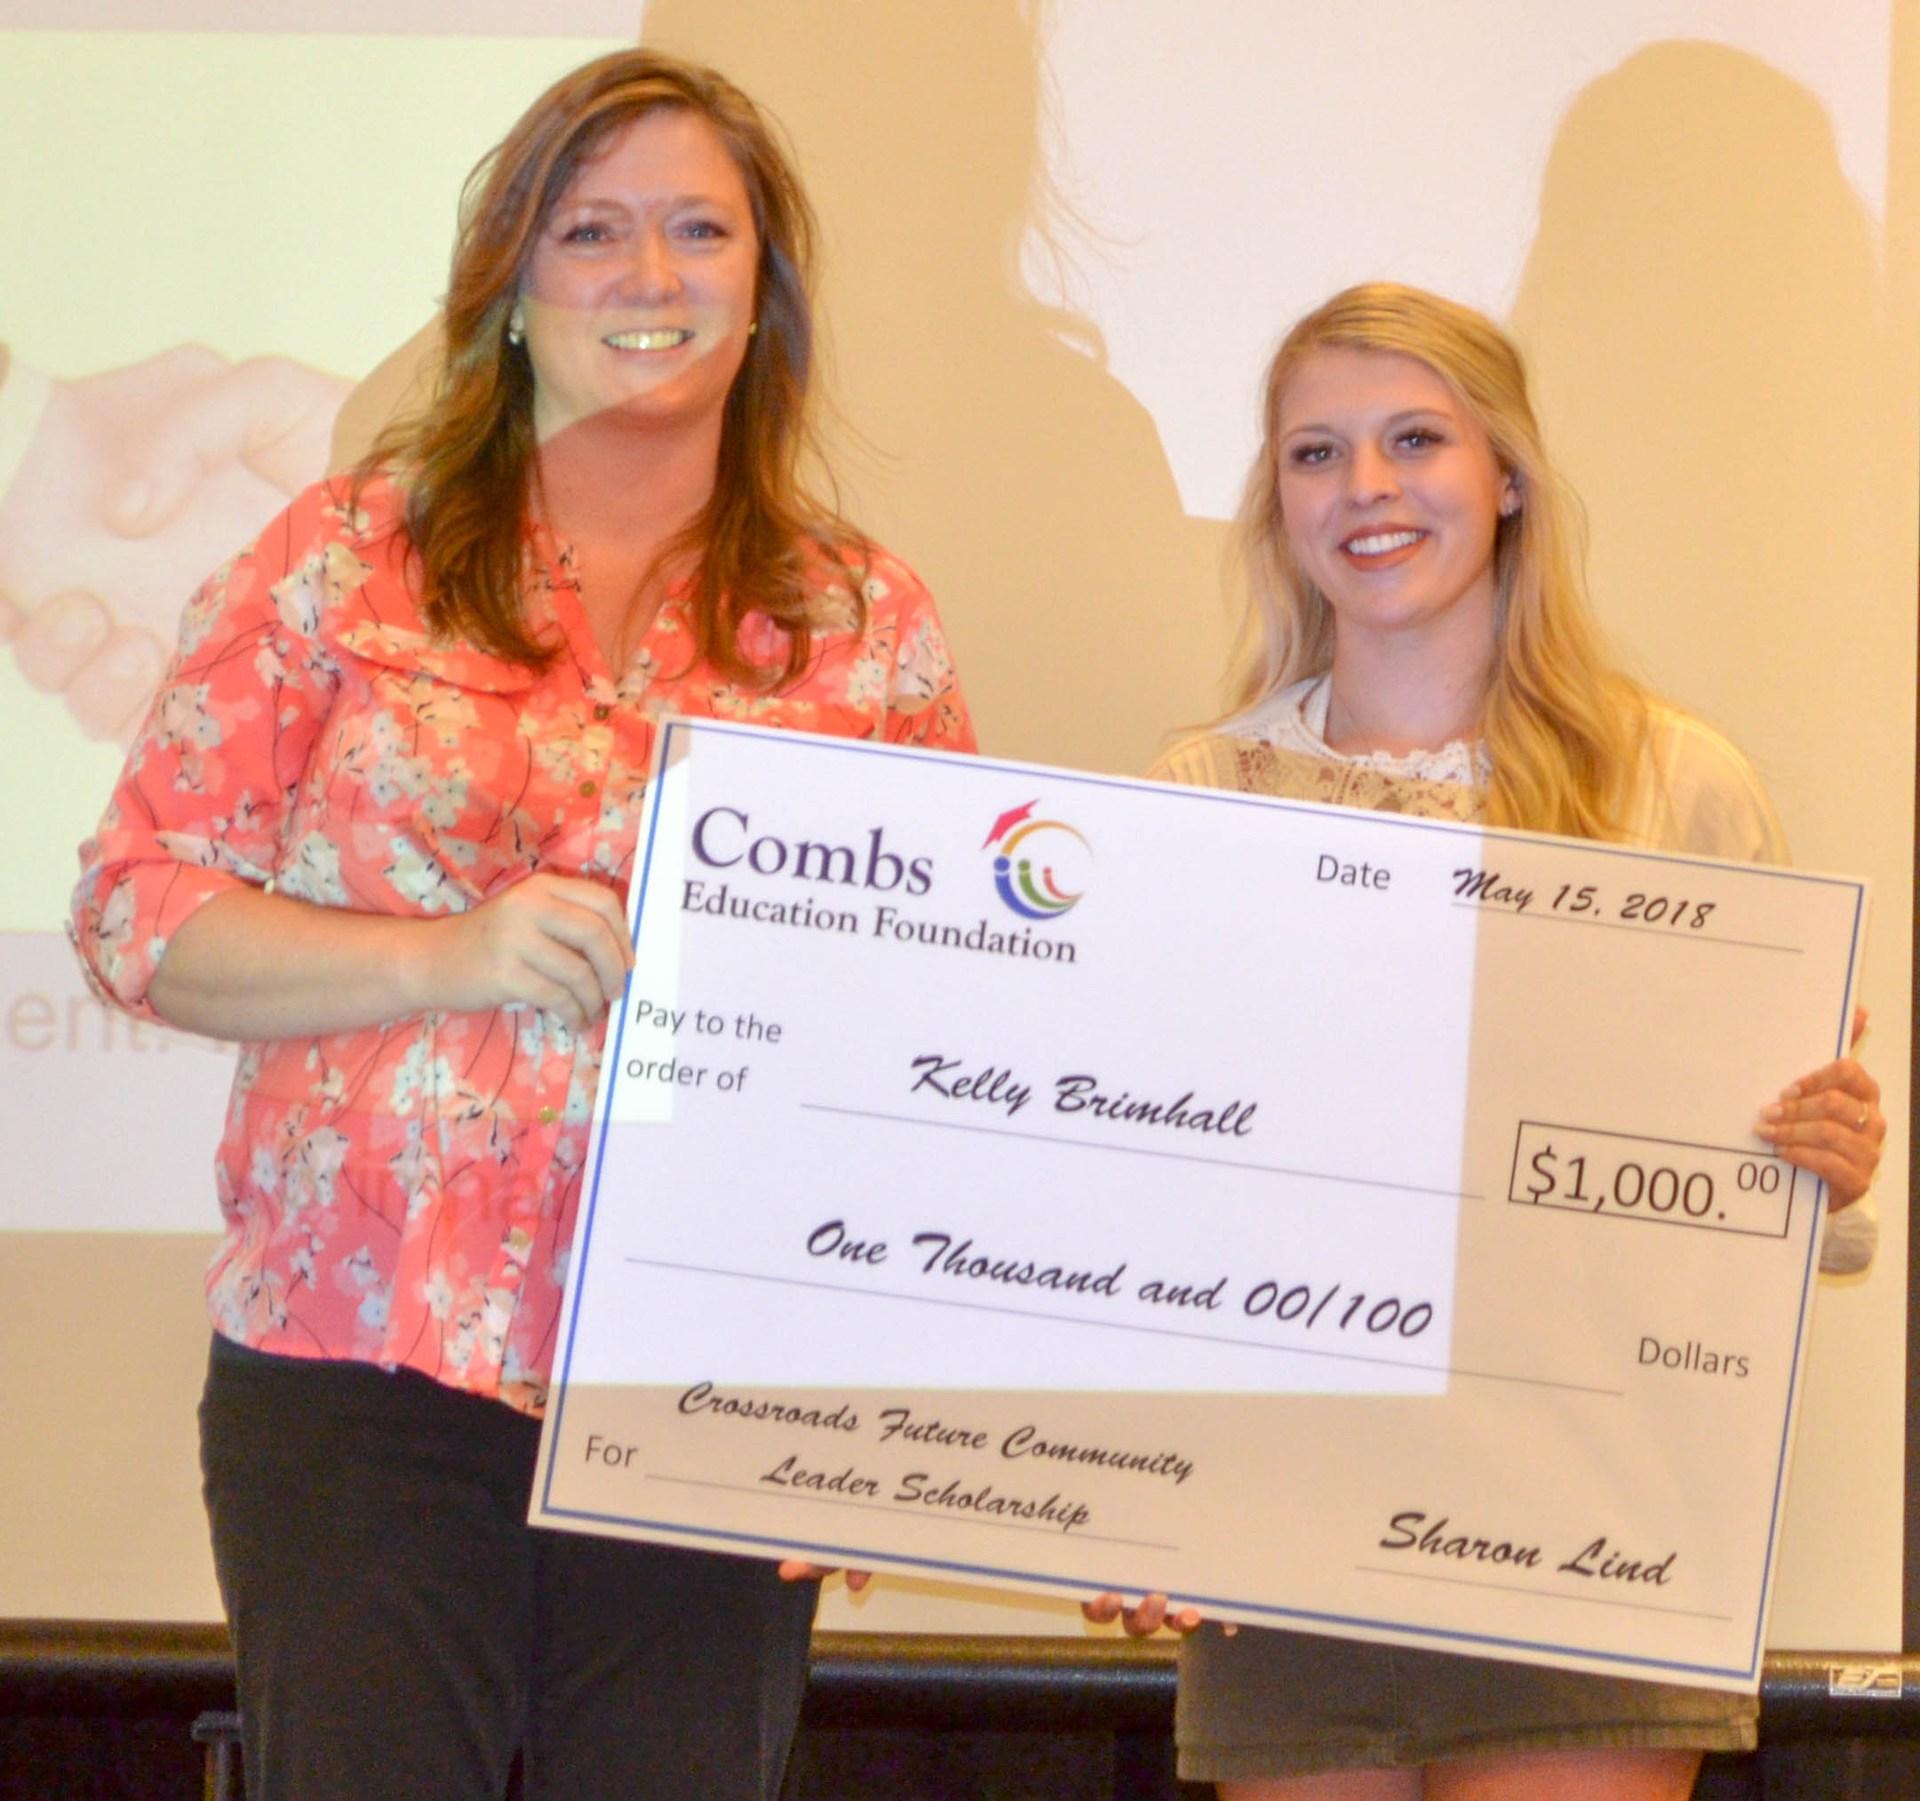 Crossroads Future Community Leader Scholarship Awardee